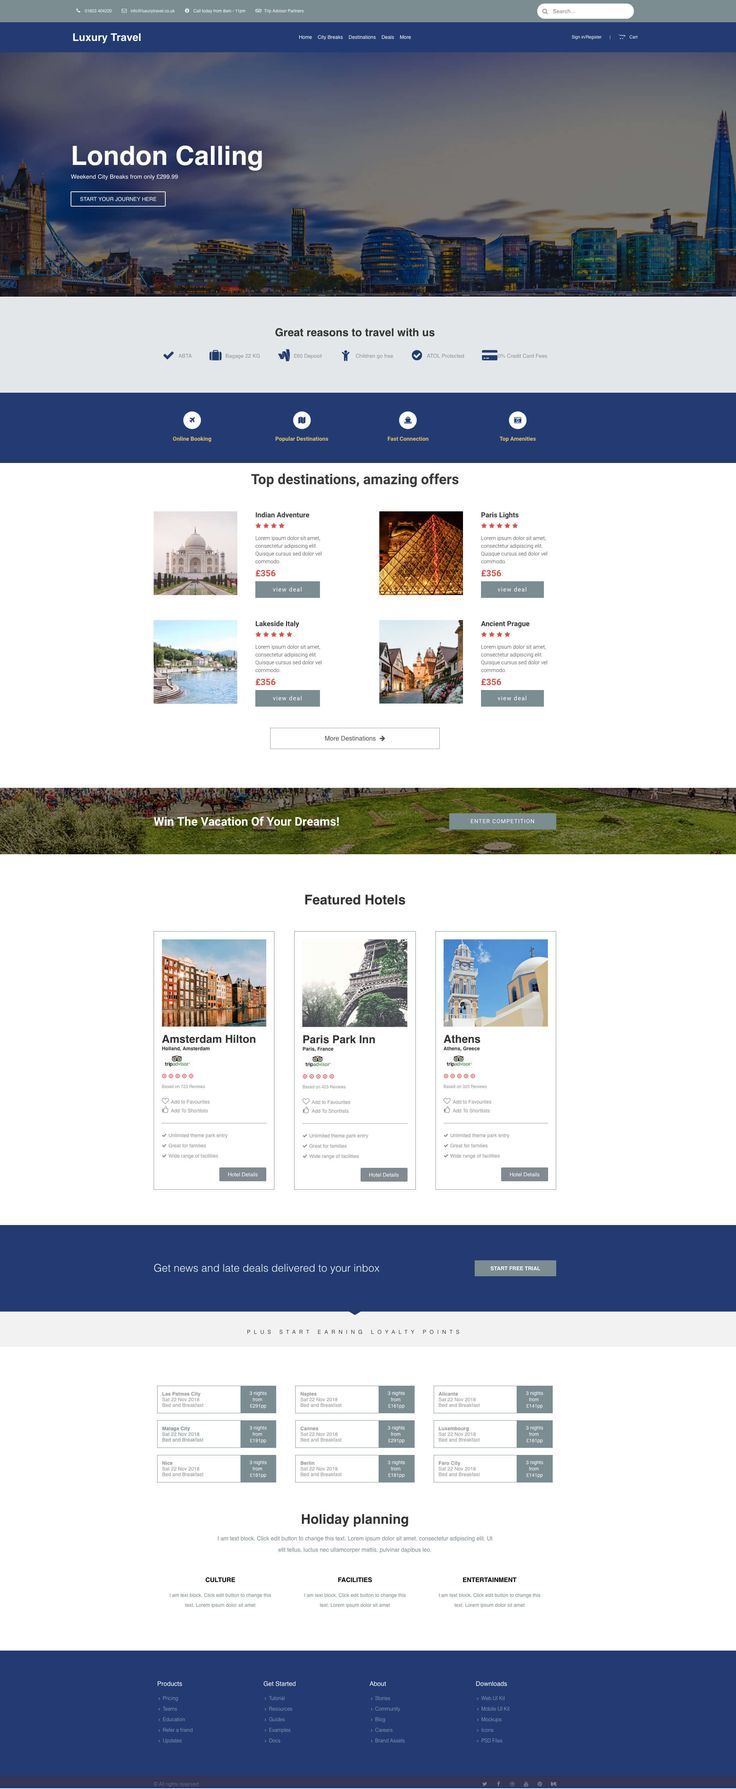 Web And App Design For A Travel Website Template Web App Design Web Design App Design